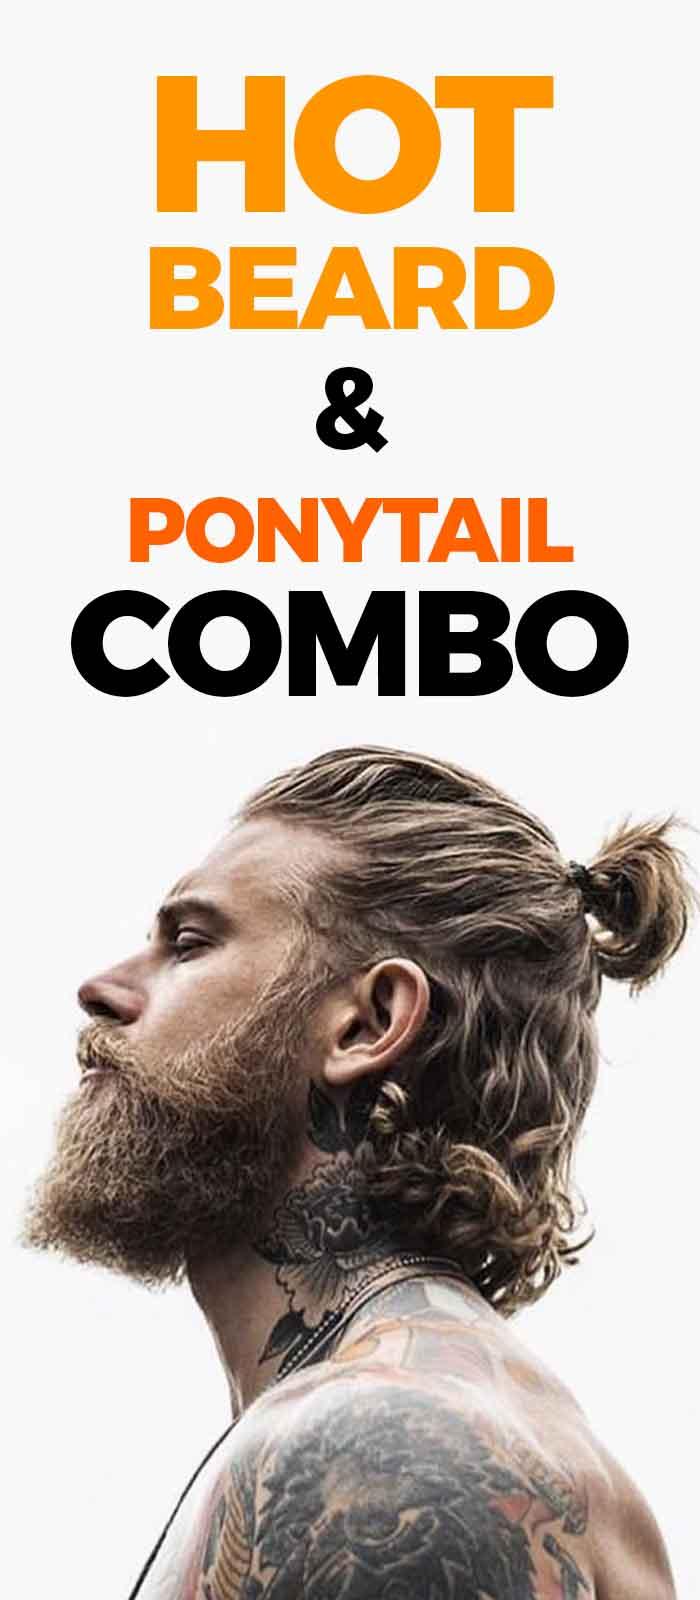 Short Ponytail With beard for men!